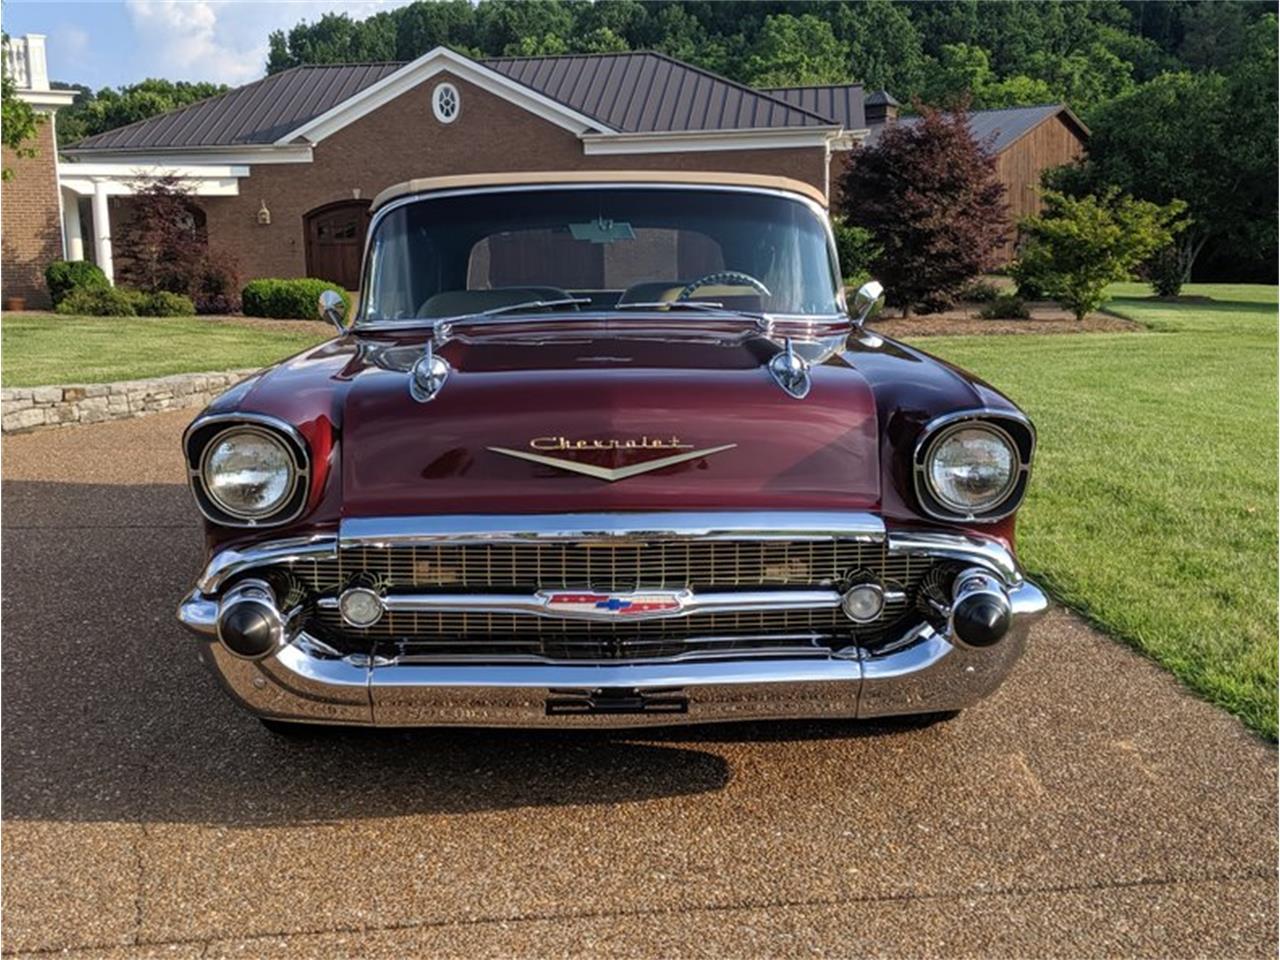 Large Picture of Classic 1957 Chevrolet Bel Air located in Greensboro North Carolina - QQAY